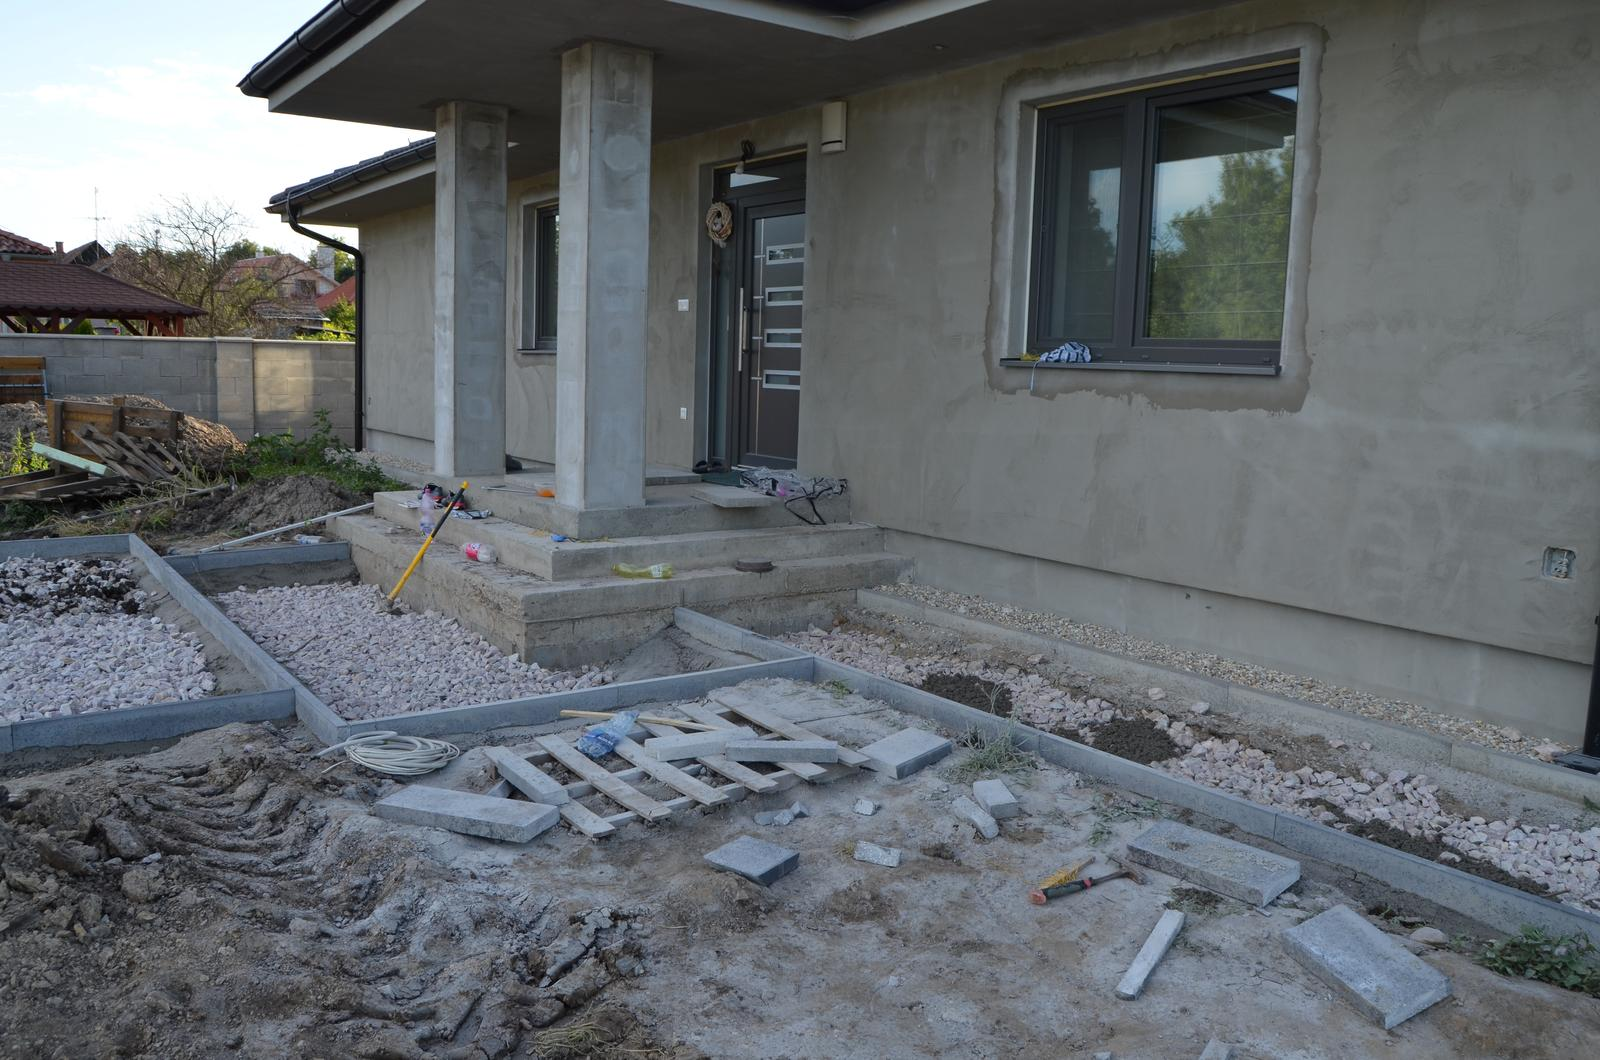 Okolie domu - Obrázok č. 37